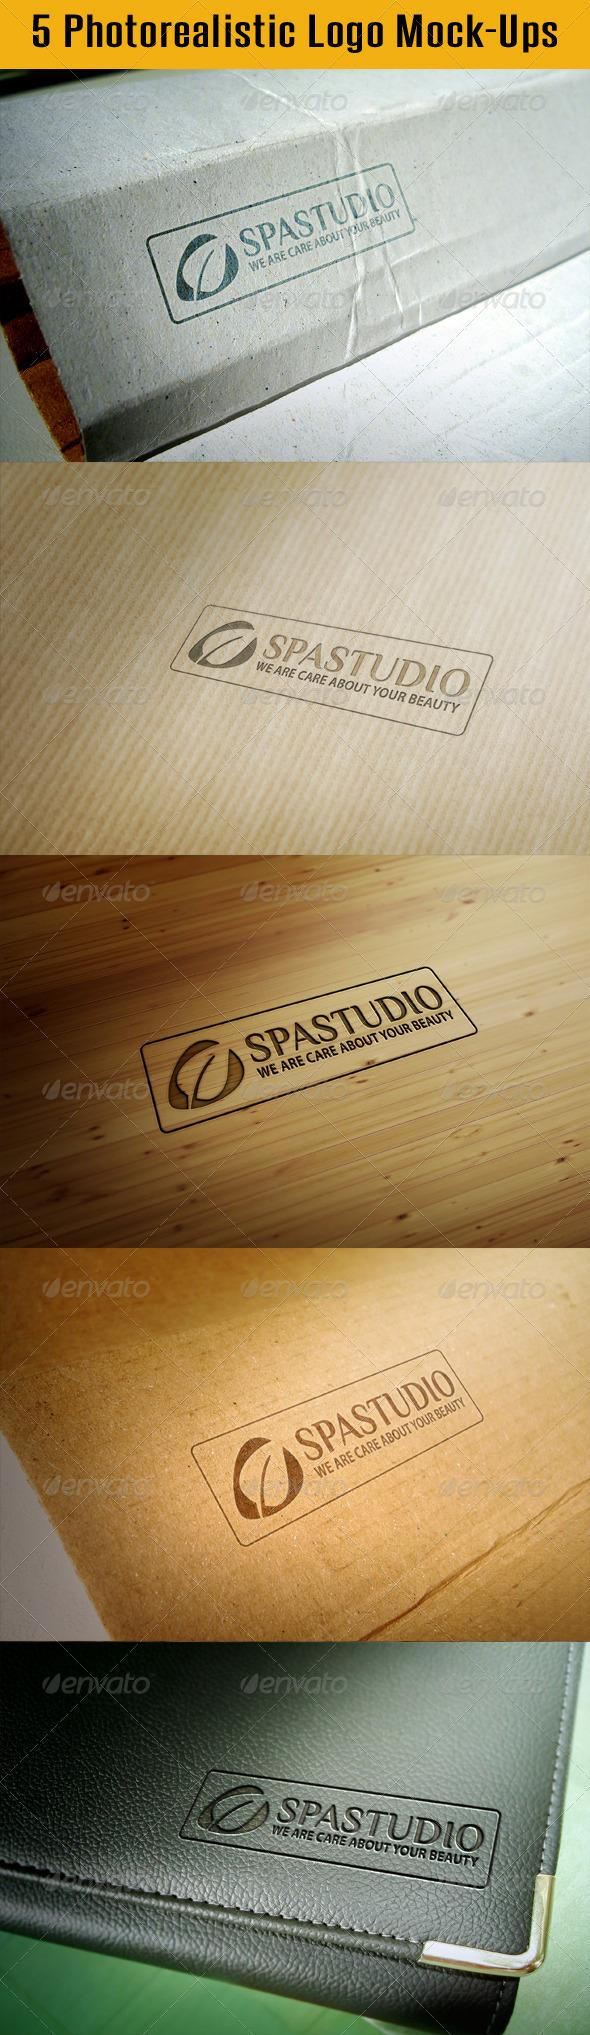 GraphicRiver 5 Photorealistic Logo Mock-Ups 4918145